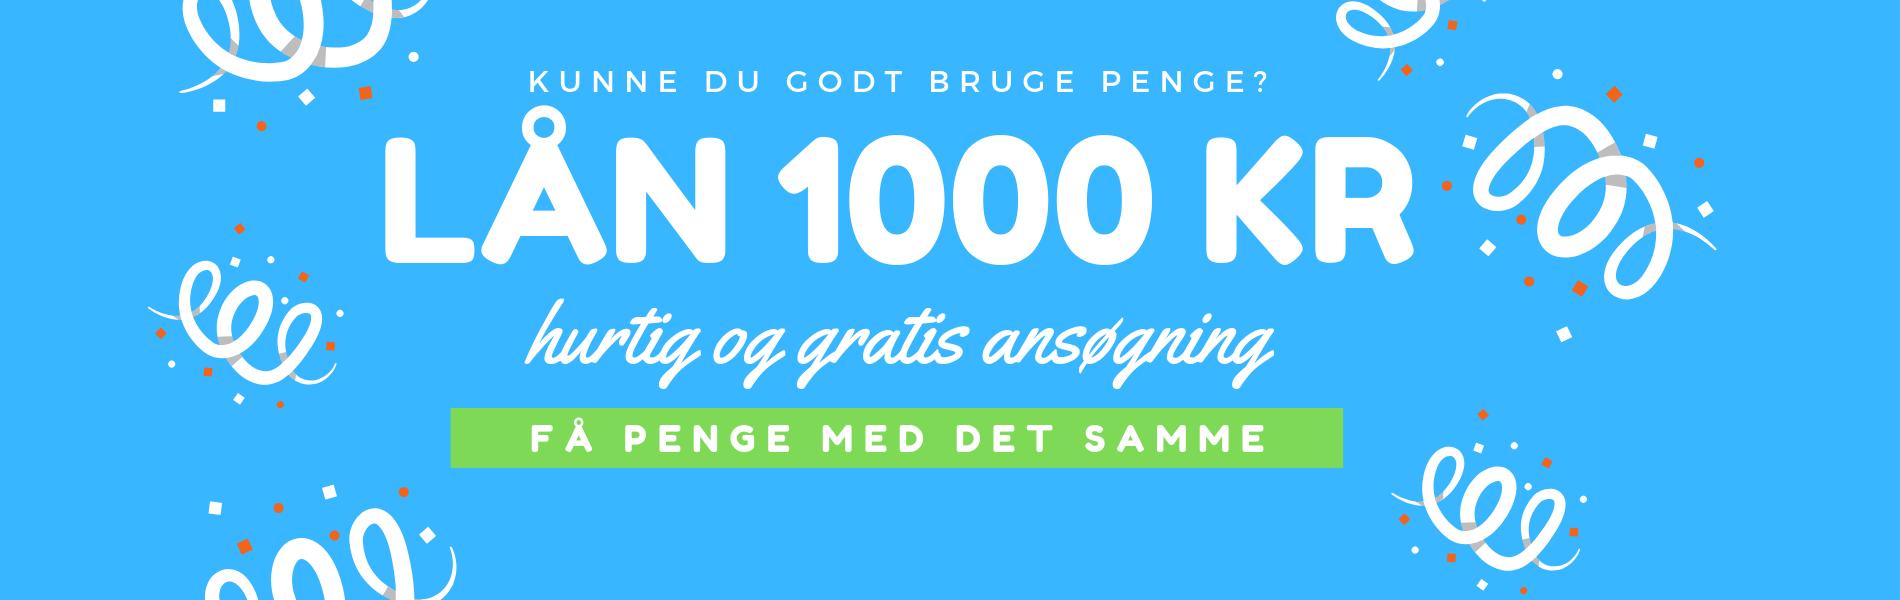 Lån 1000 kr online